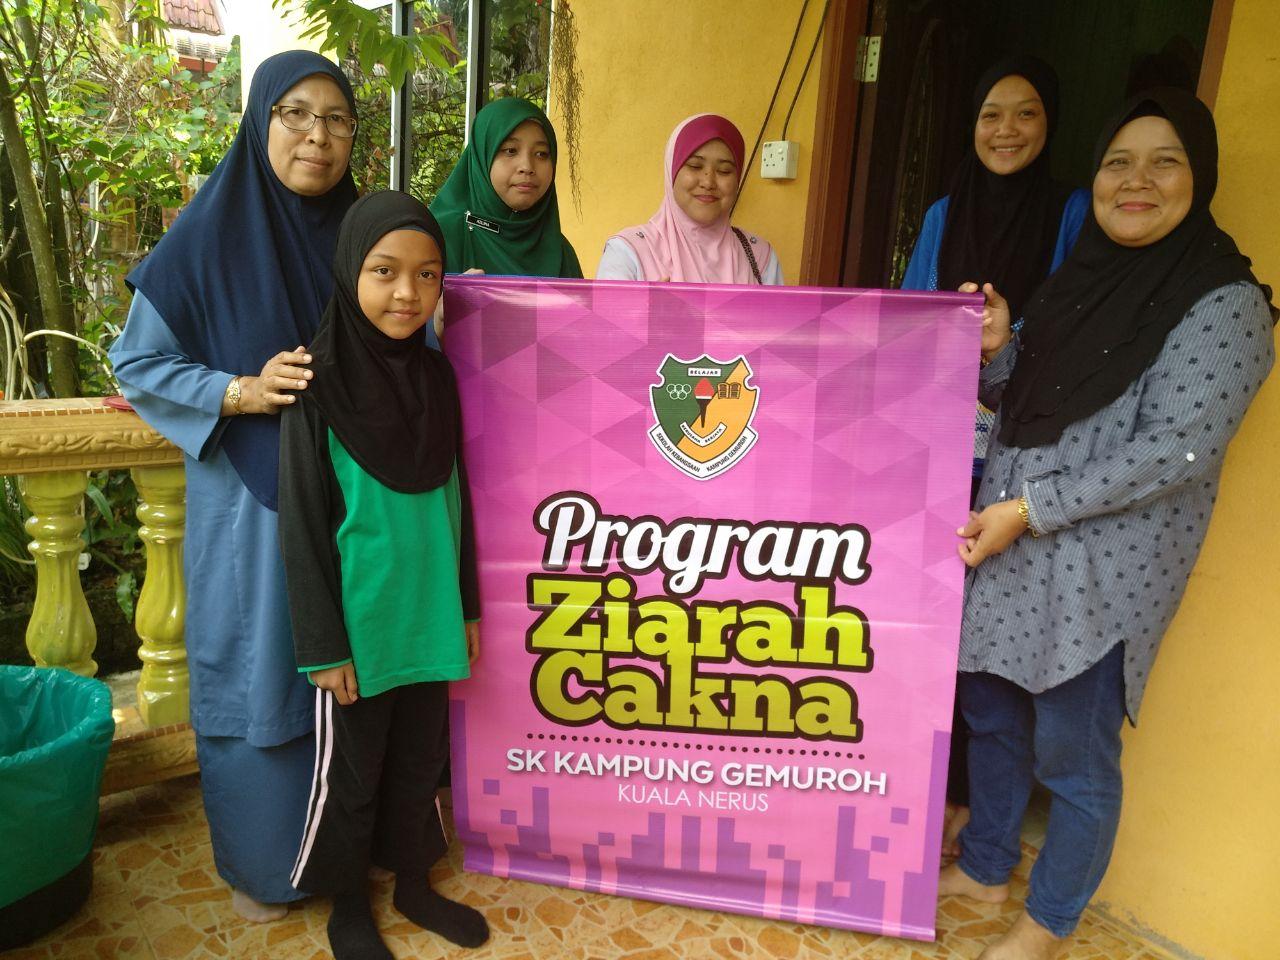 Sk Kampung Gemuroh Program Ziarah Cakna